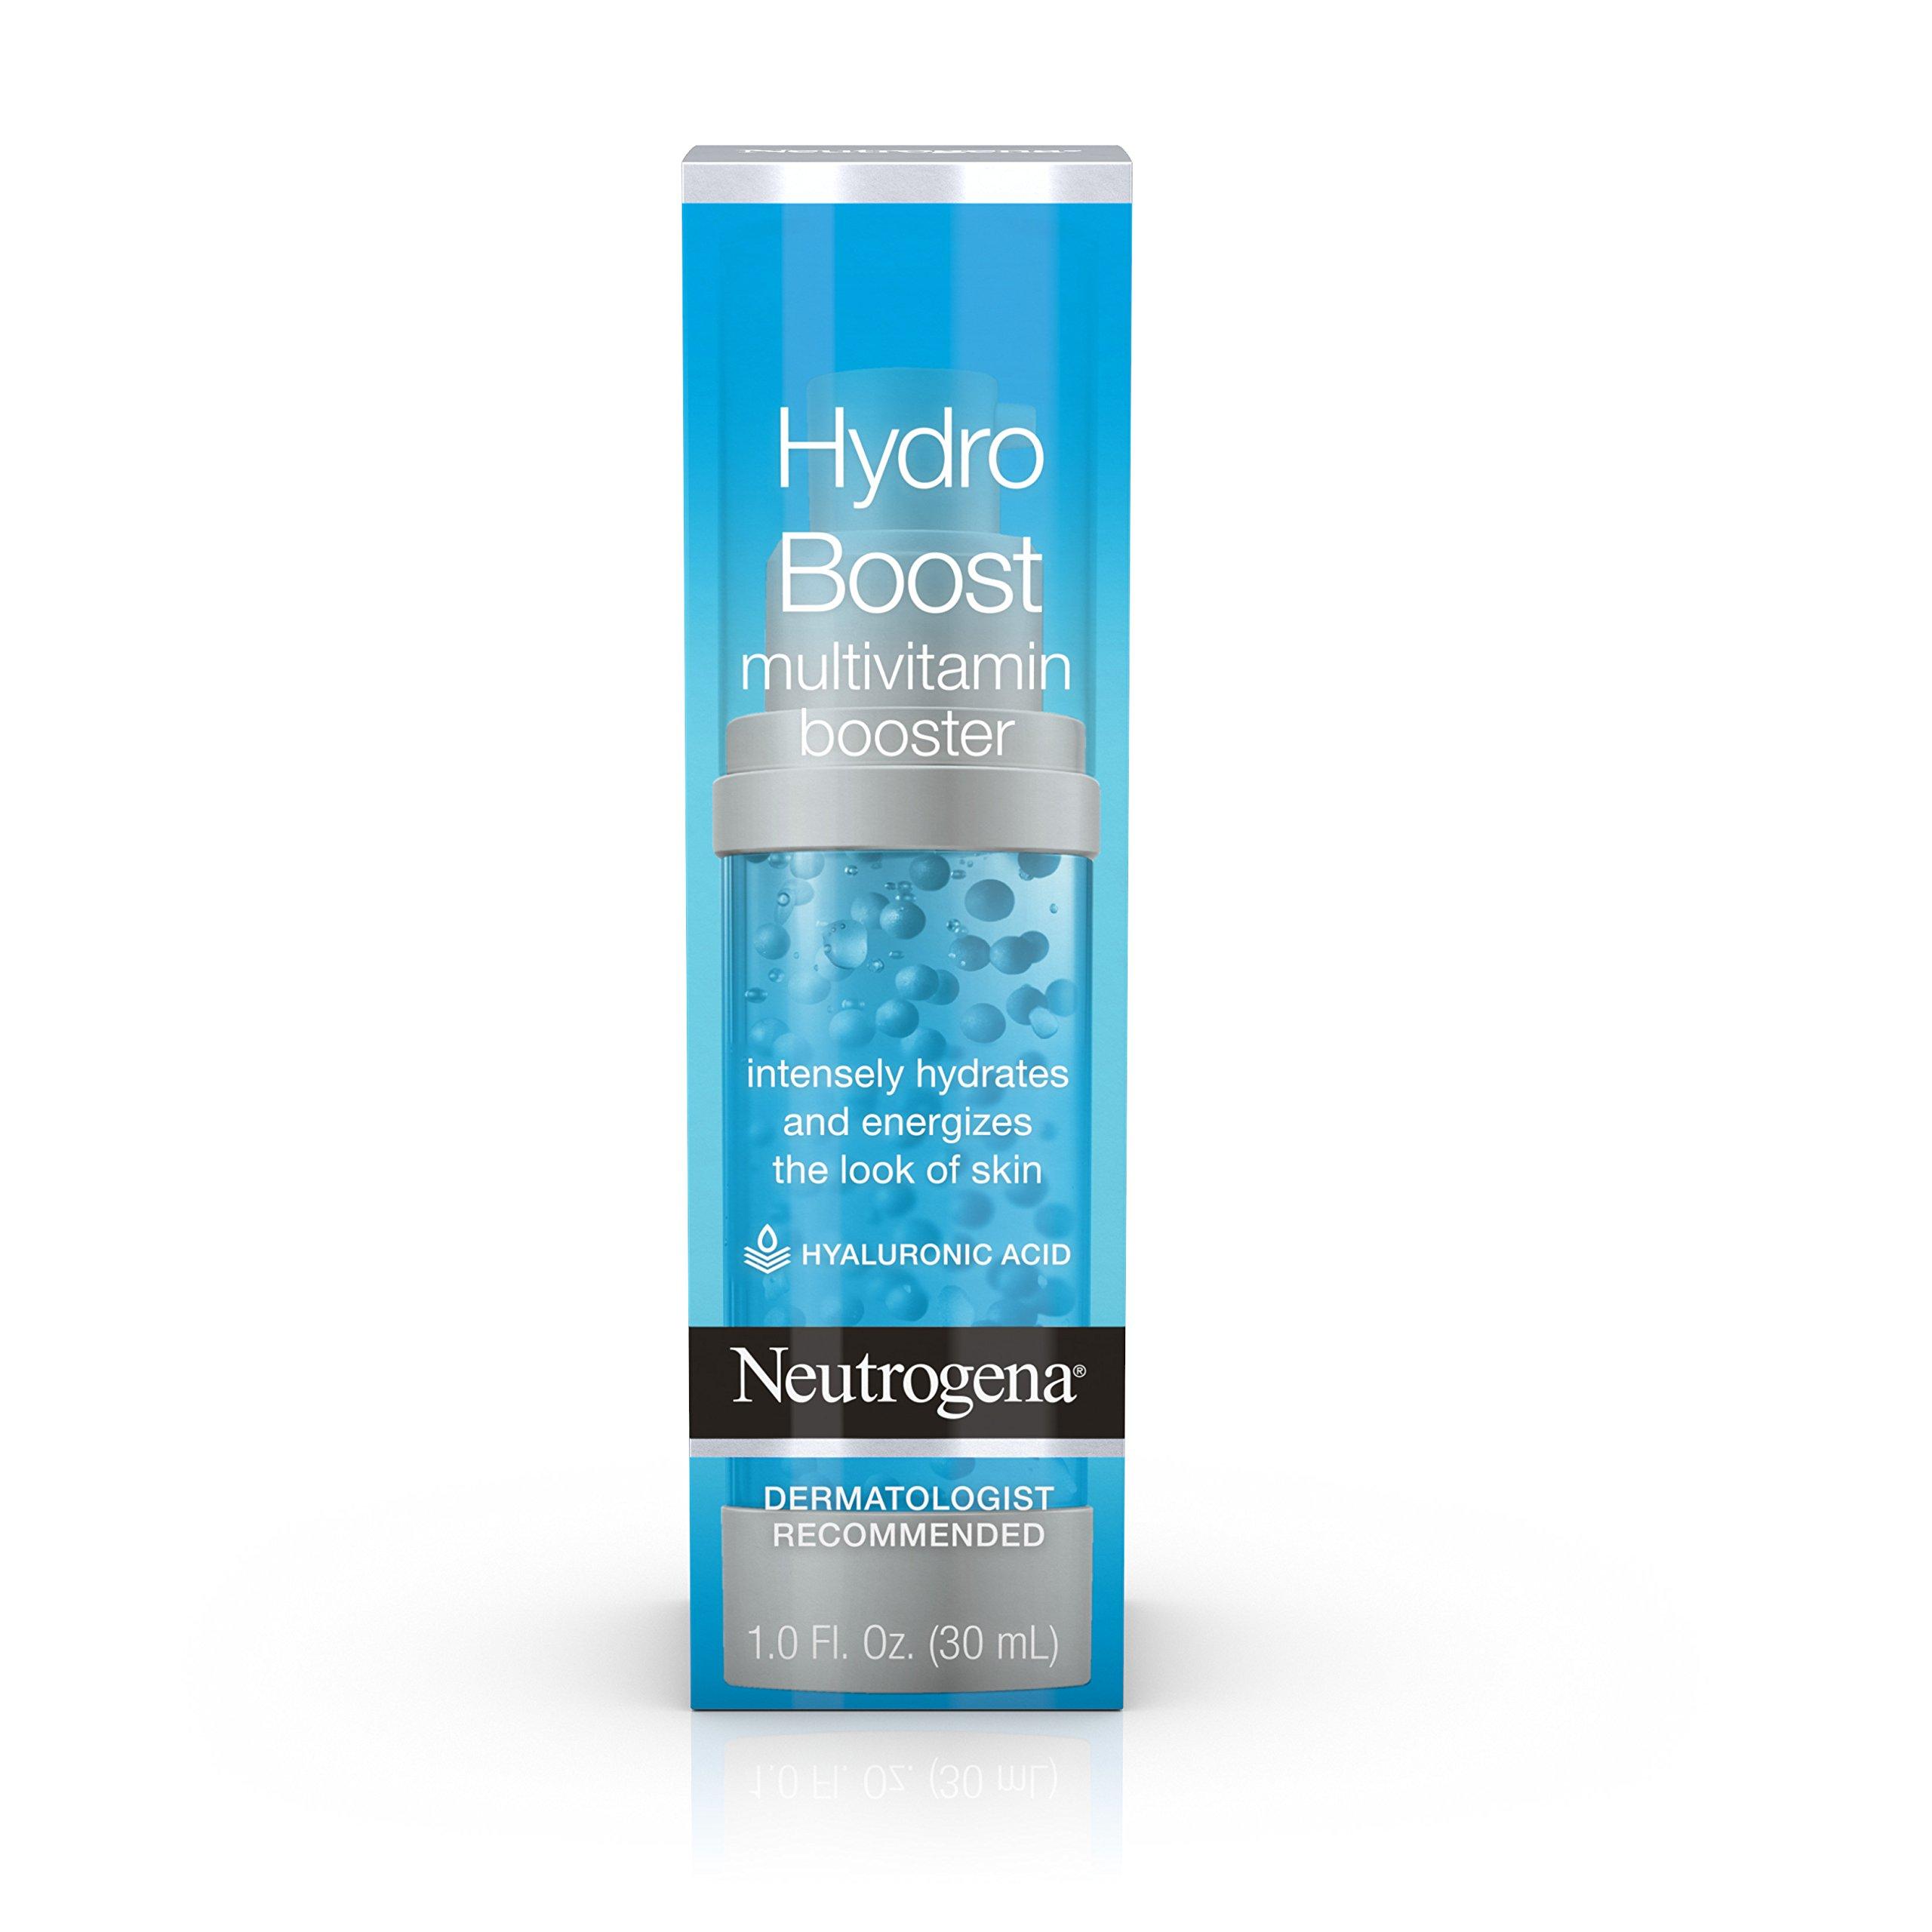 Neutrogena Hydro Boost Multivitamin Hydrating and Revitalizing Face Serum, 1 Ounce